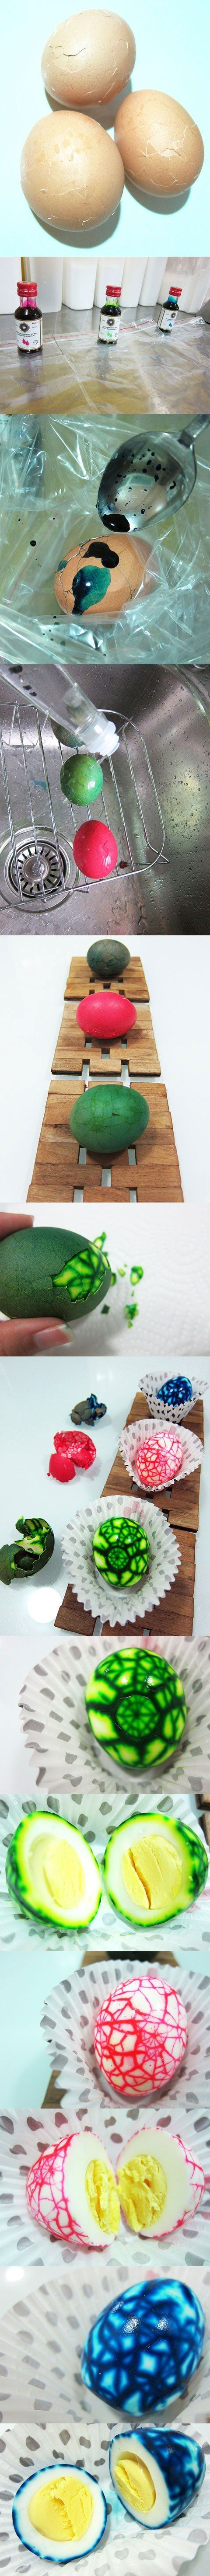 easter eggs just got cooler